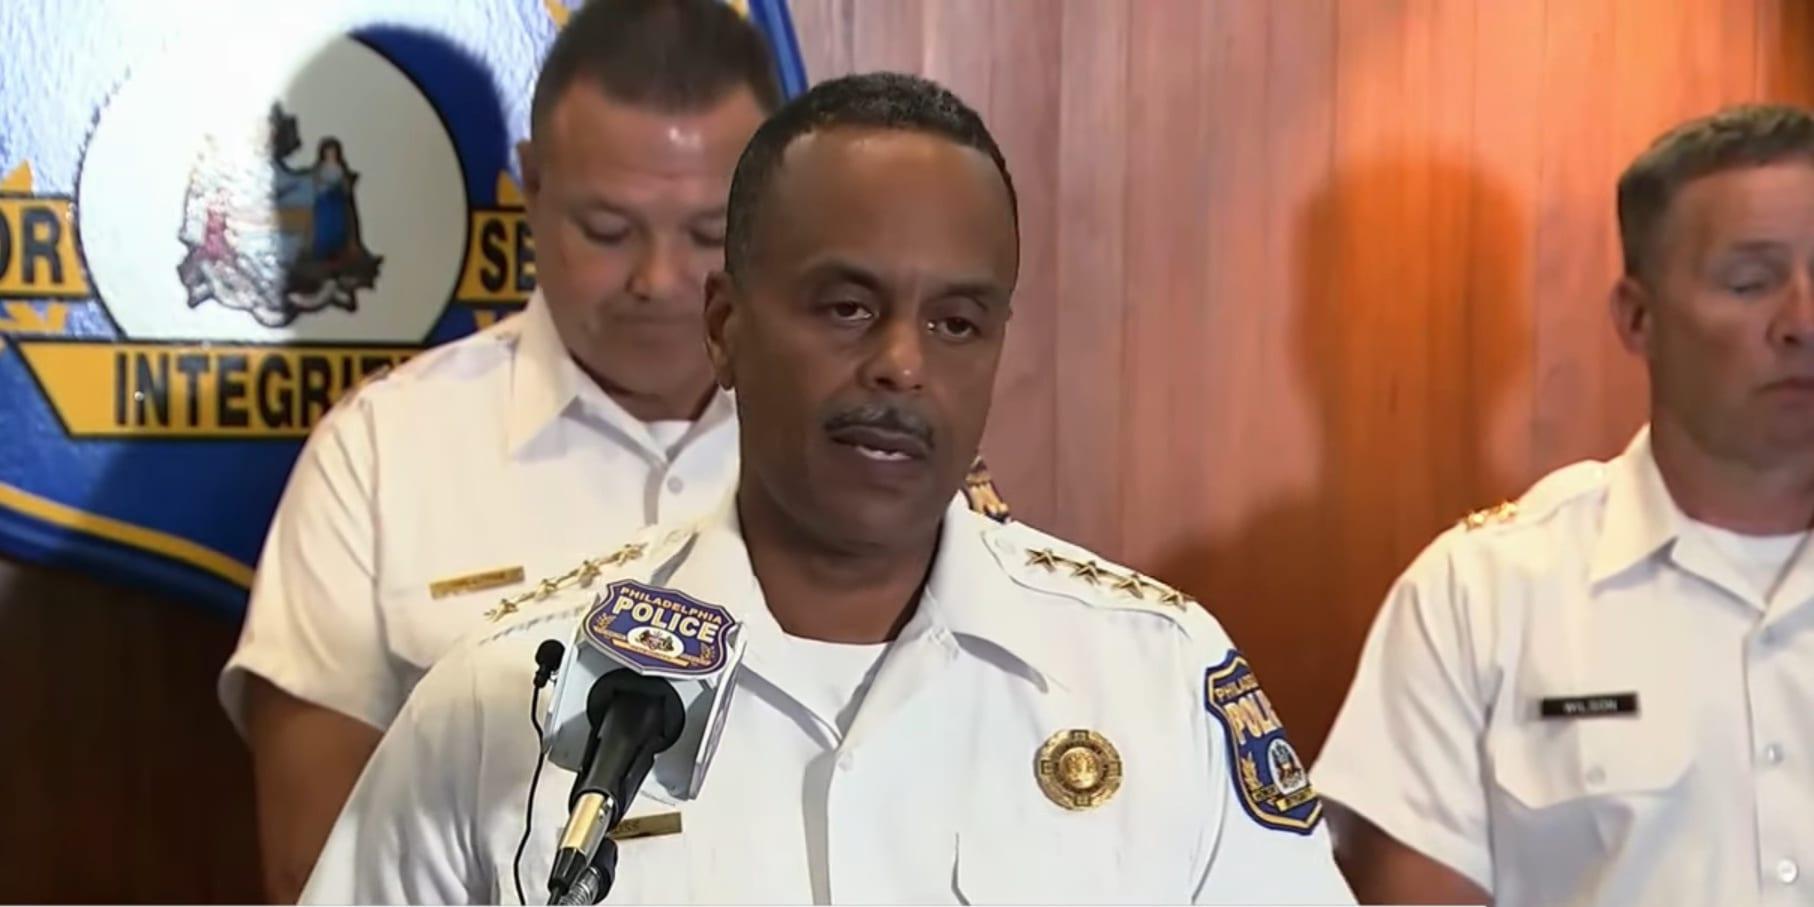 69 Philly Cops Punished For Hateful Facebook Posts